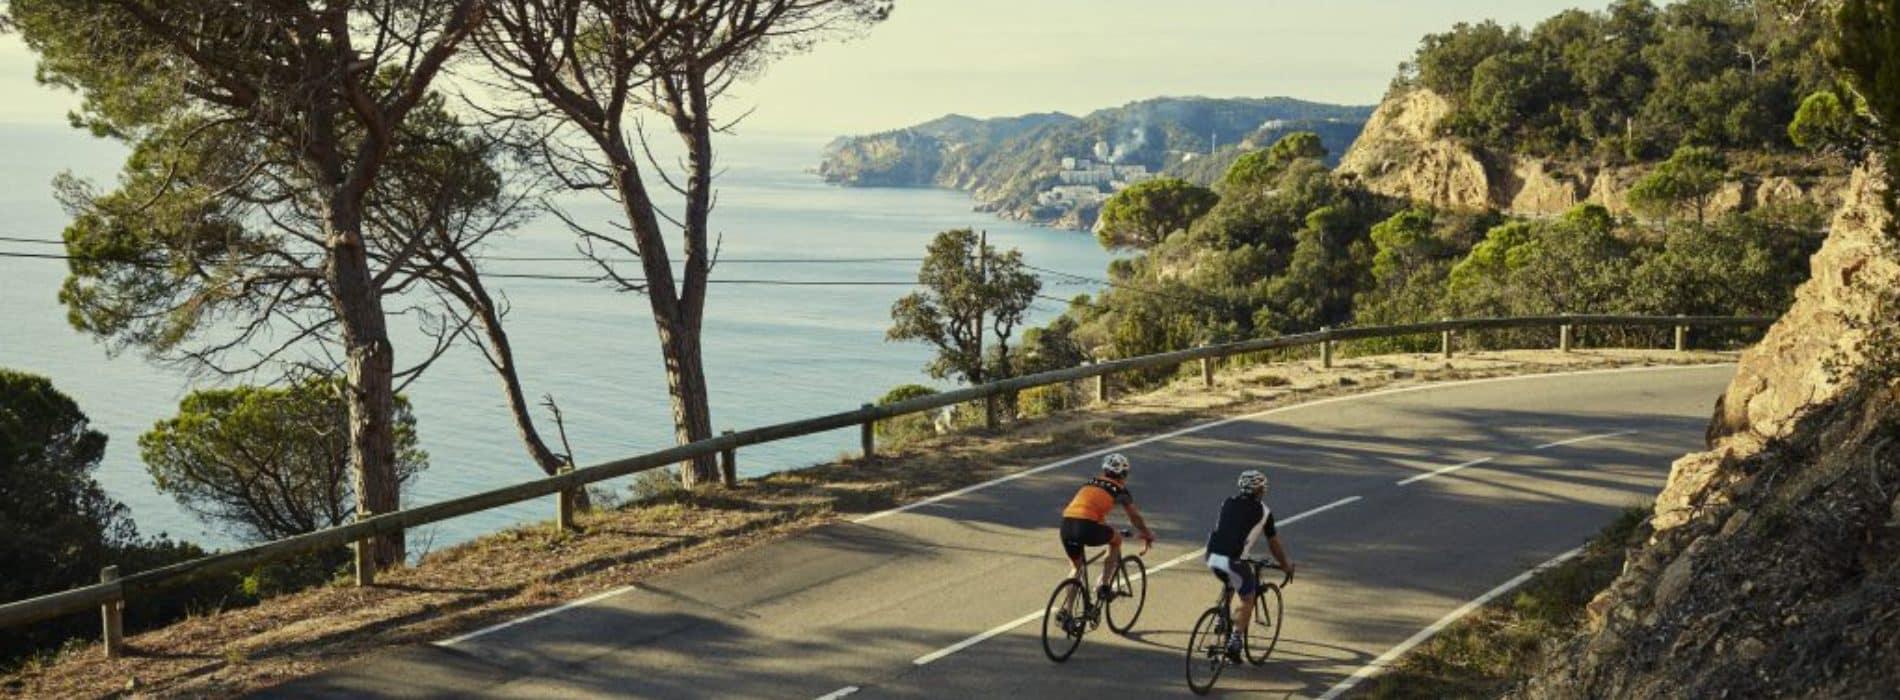 Stage de vélo sur la Costa Brava: Tossa de Mar du 2 au 9 mai 2021